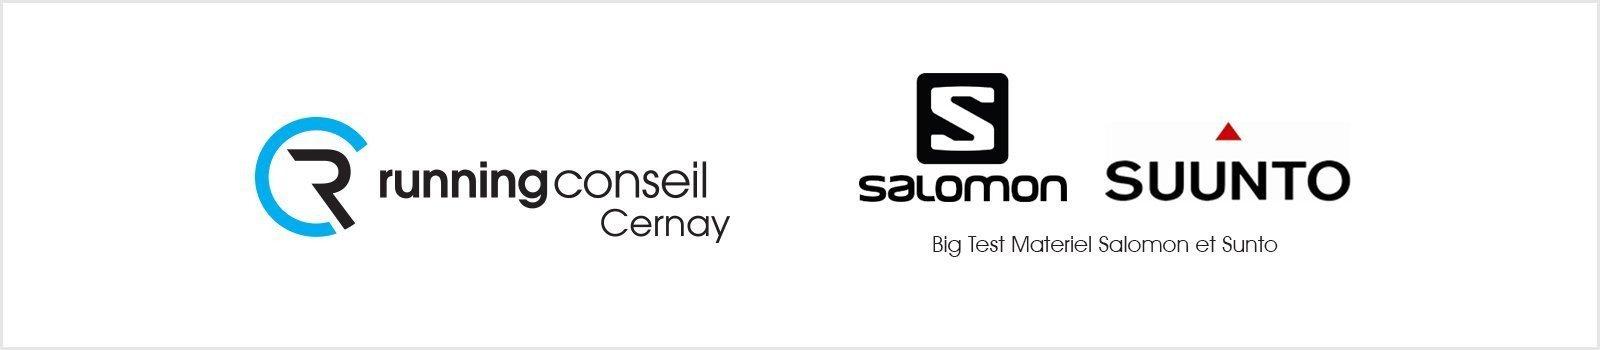 Big Test Materiel Salomon et Sunto